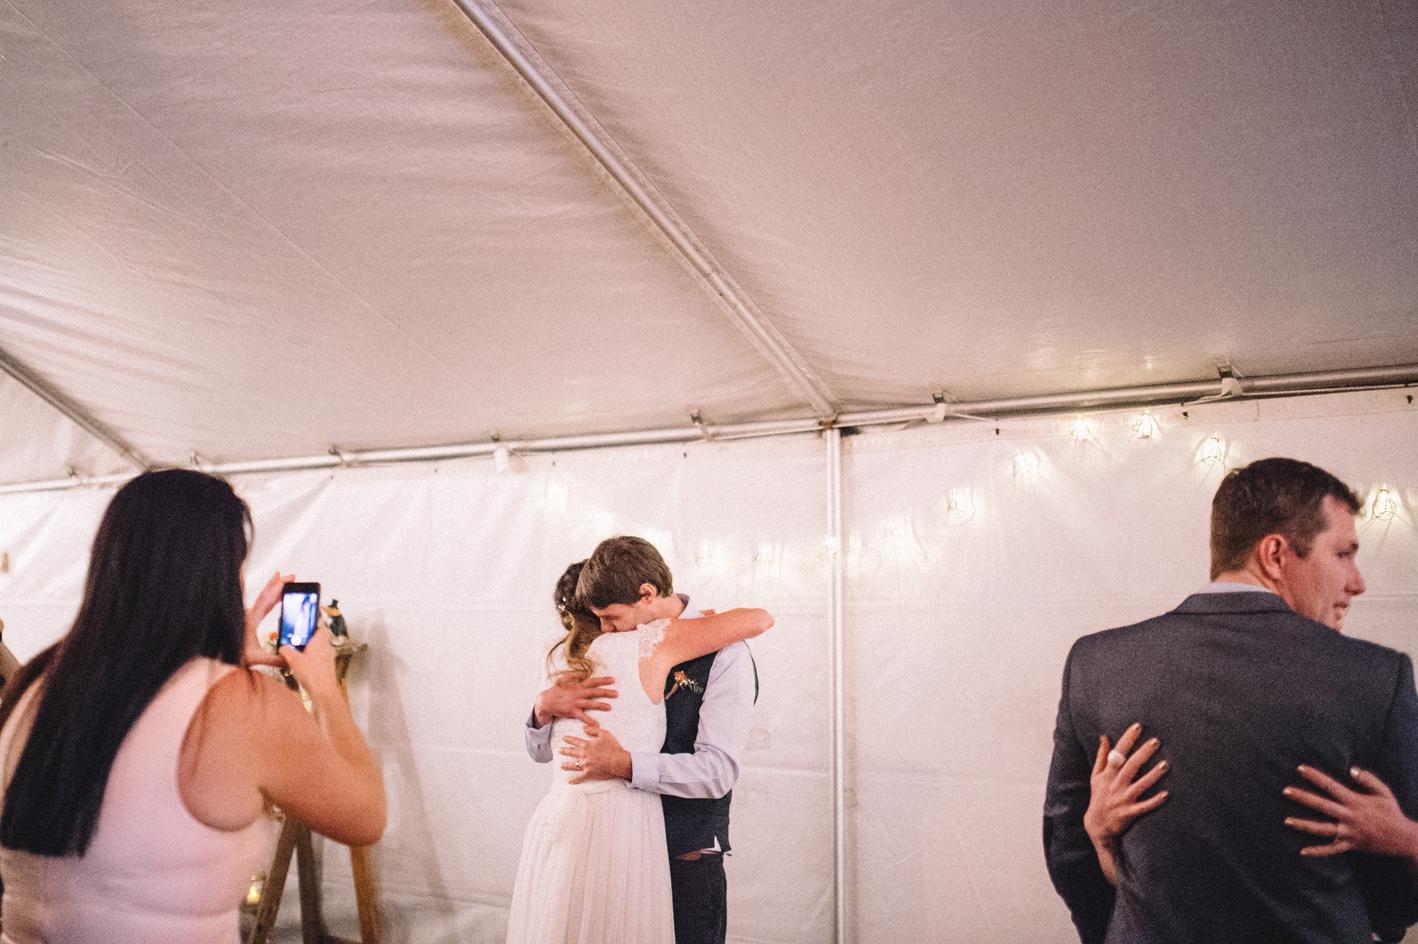 092-michelle-reagan-mount-tamborine-wedding-sophie-baker-photography